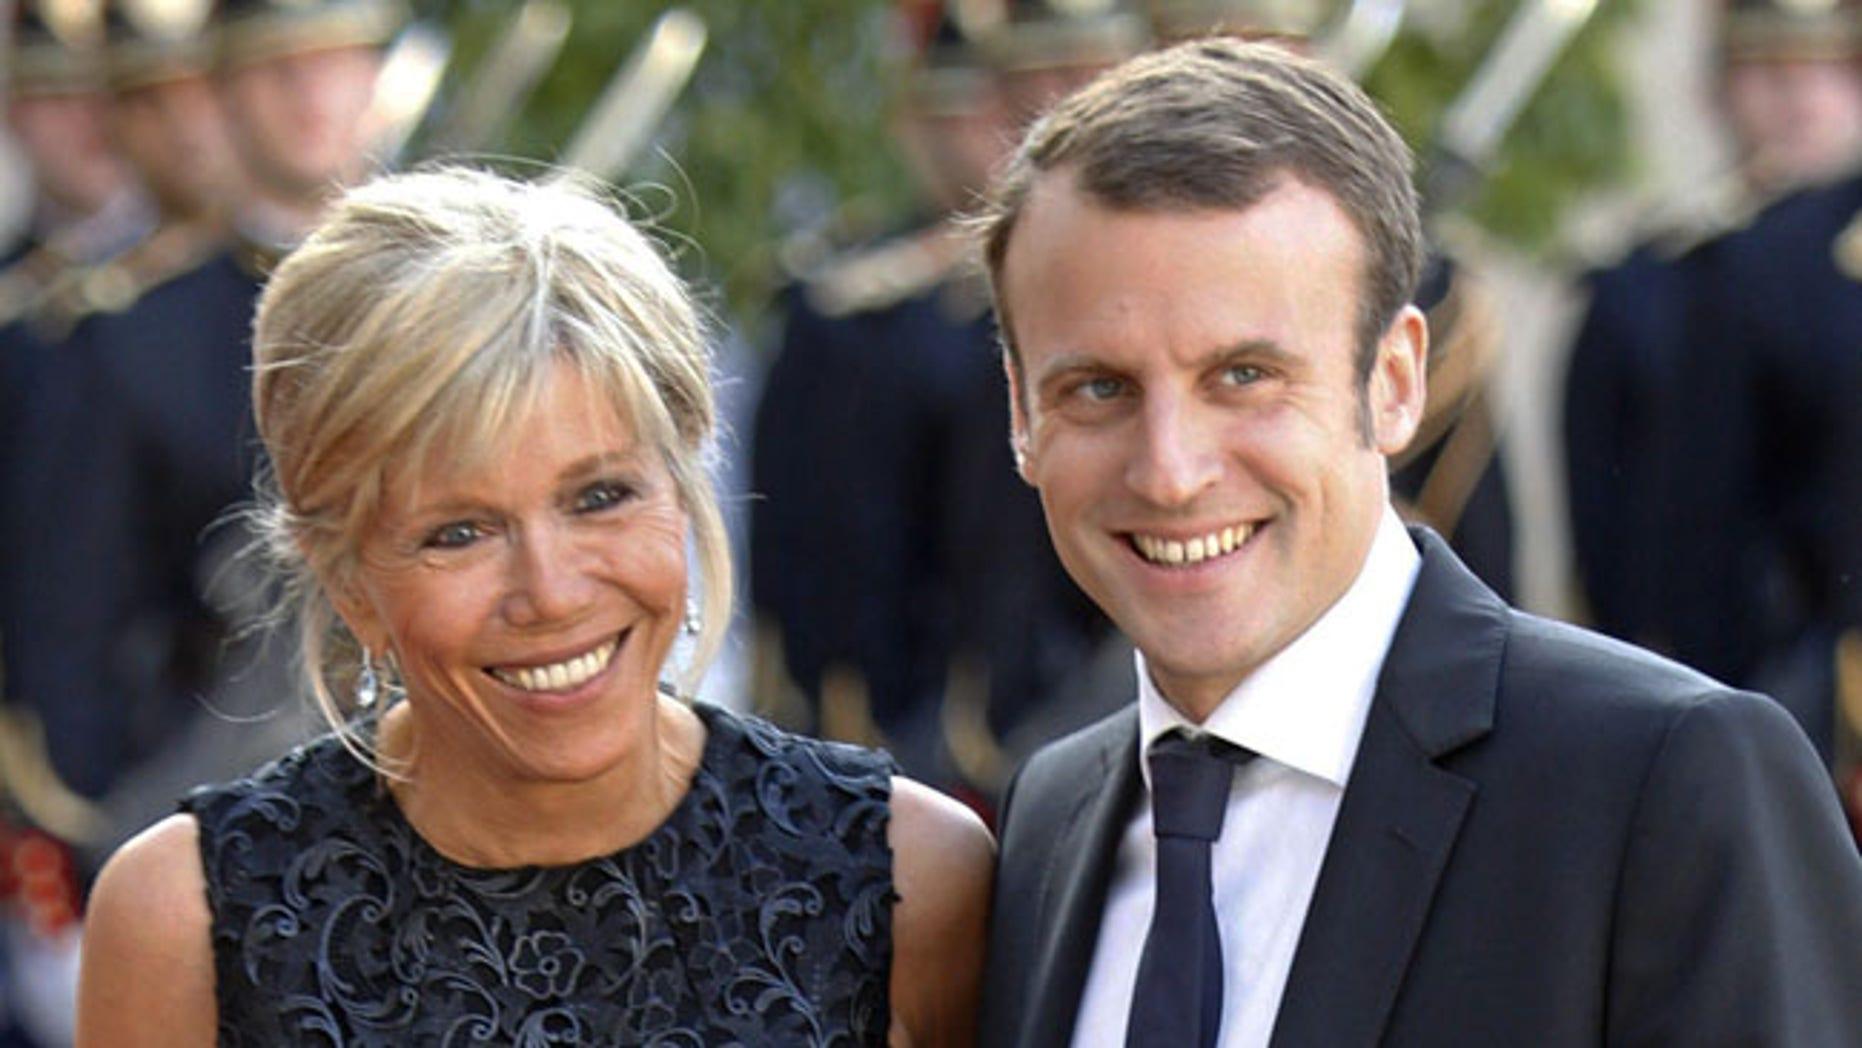 Emmanuel Macron is seen with his wife Brigitte Trognuex at the Elysee Palace in Paris, France, June 2, 2015.